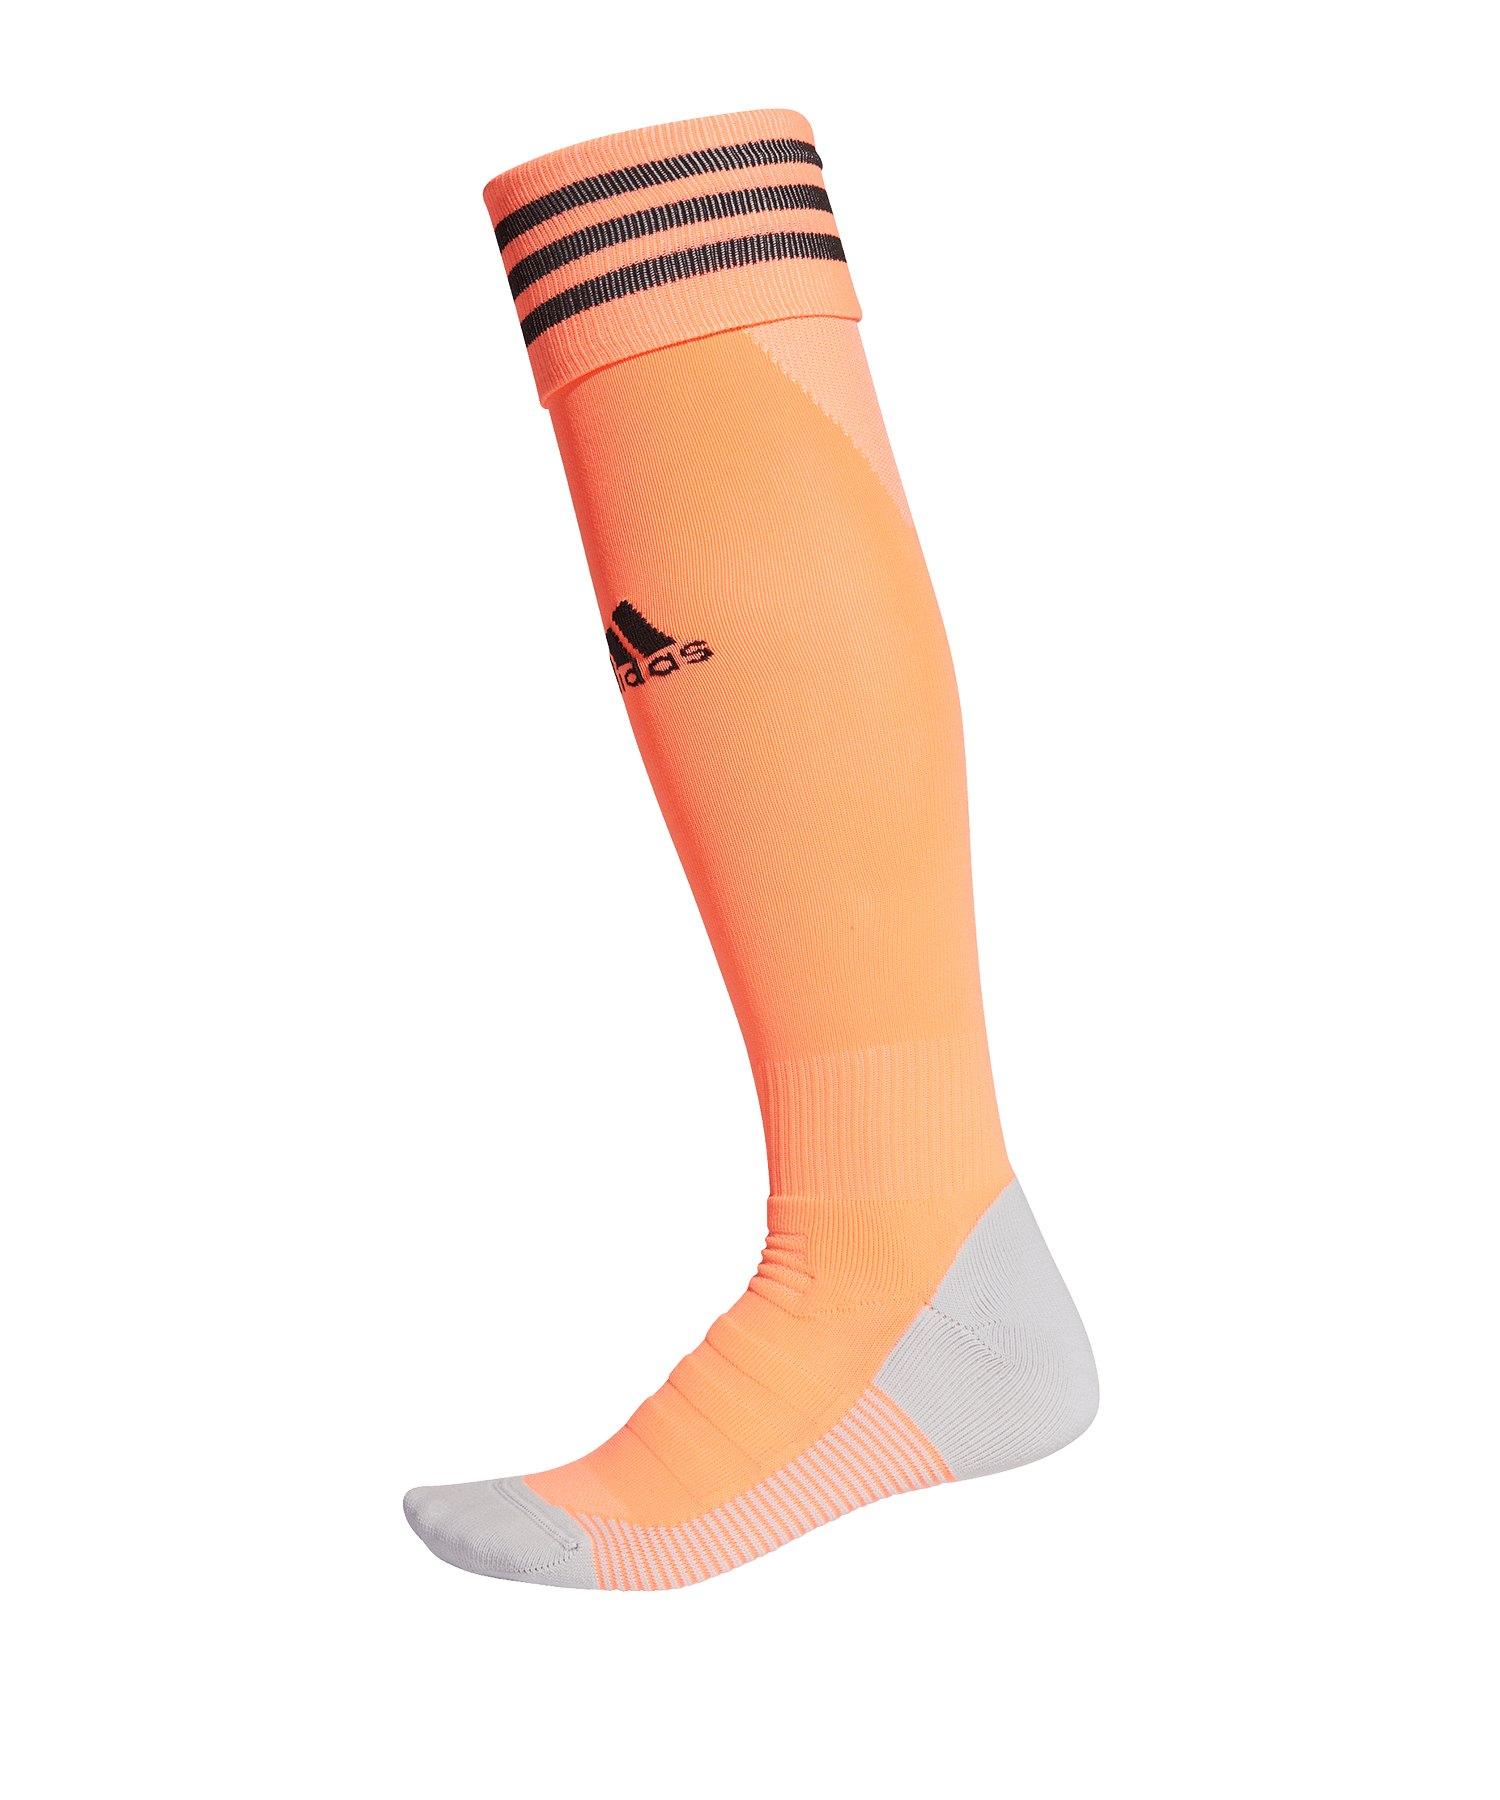 adidas Adisock 18 Stutzenstrumpf Hellrot - orange